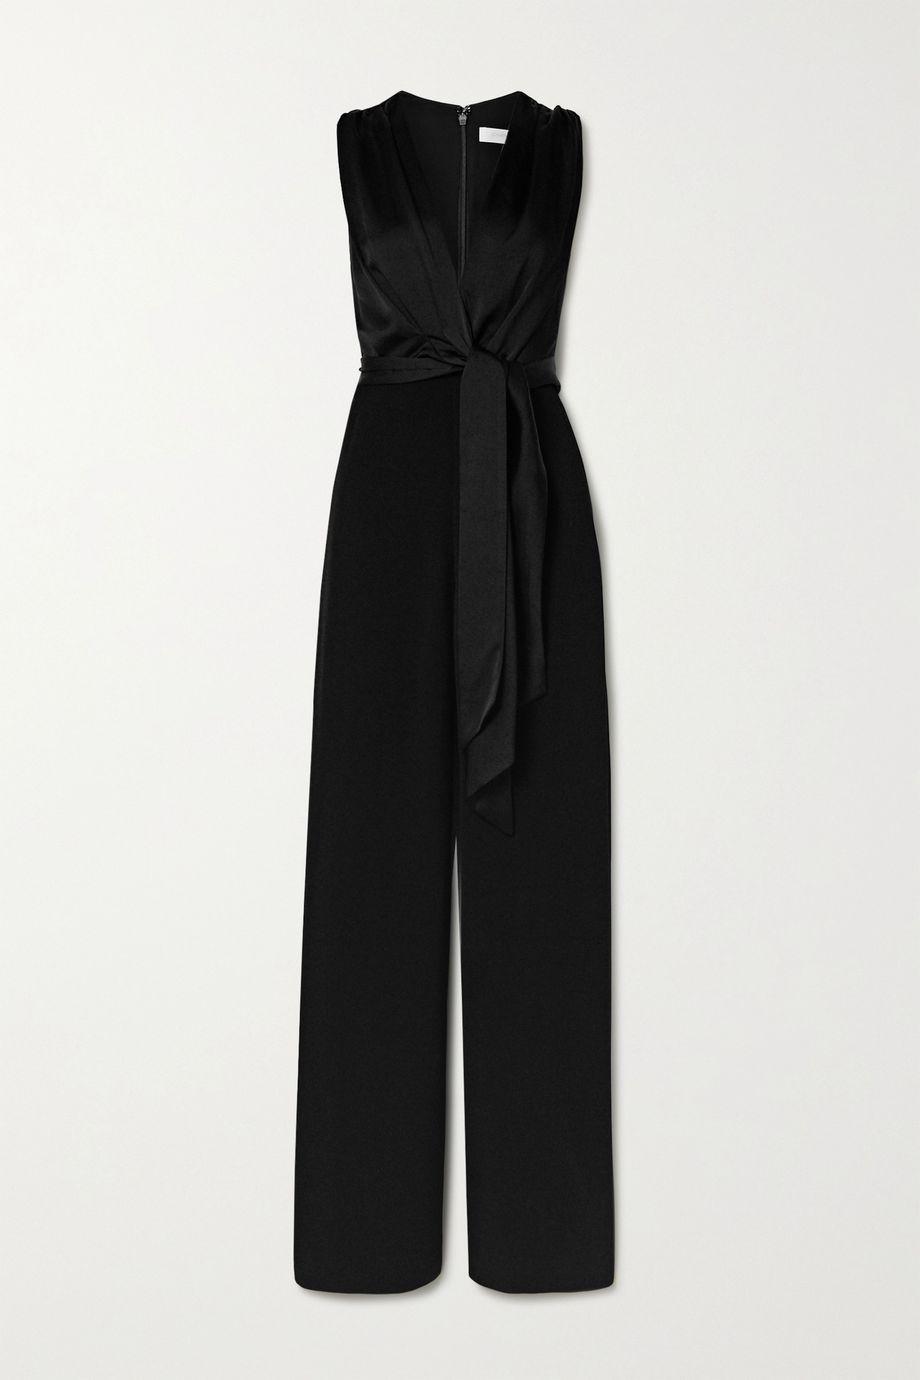 Jonathan Simkhai Tie-front draped cady and satin jumpsuit